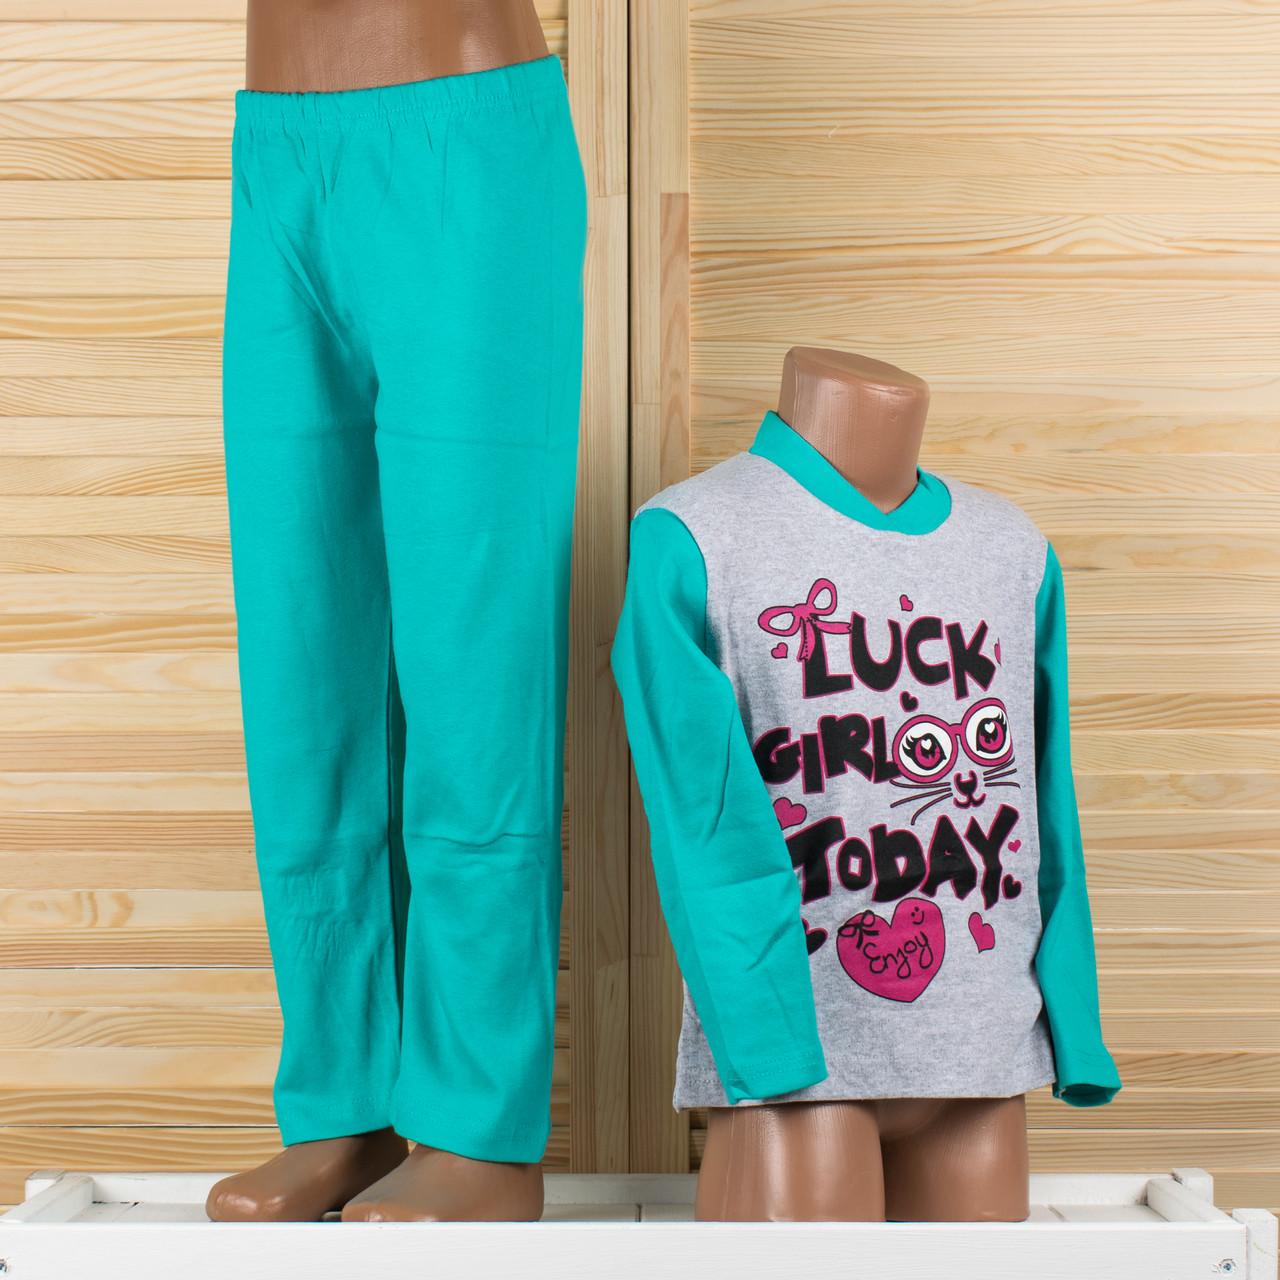 Детская пижама на девочку Турция. Moral 04-7 2/3. Размер на 2/3 года.